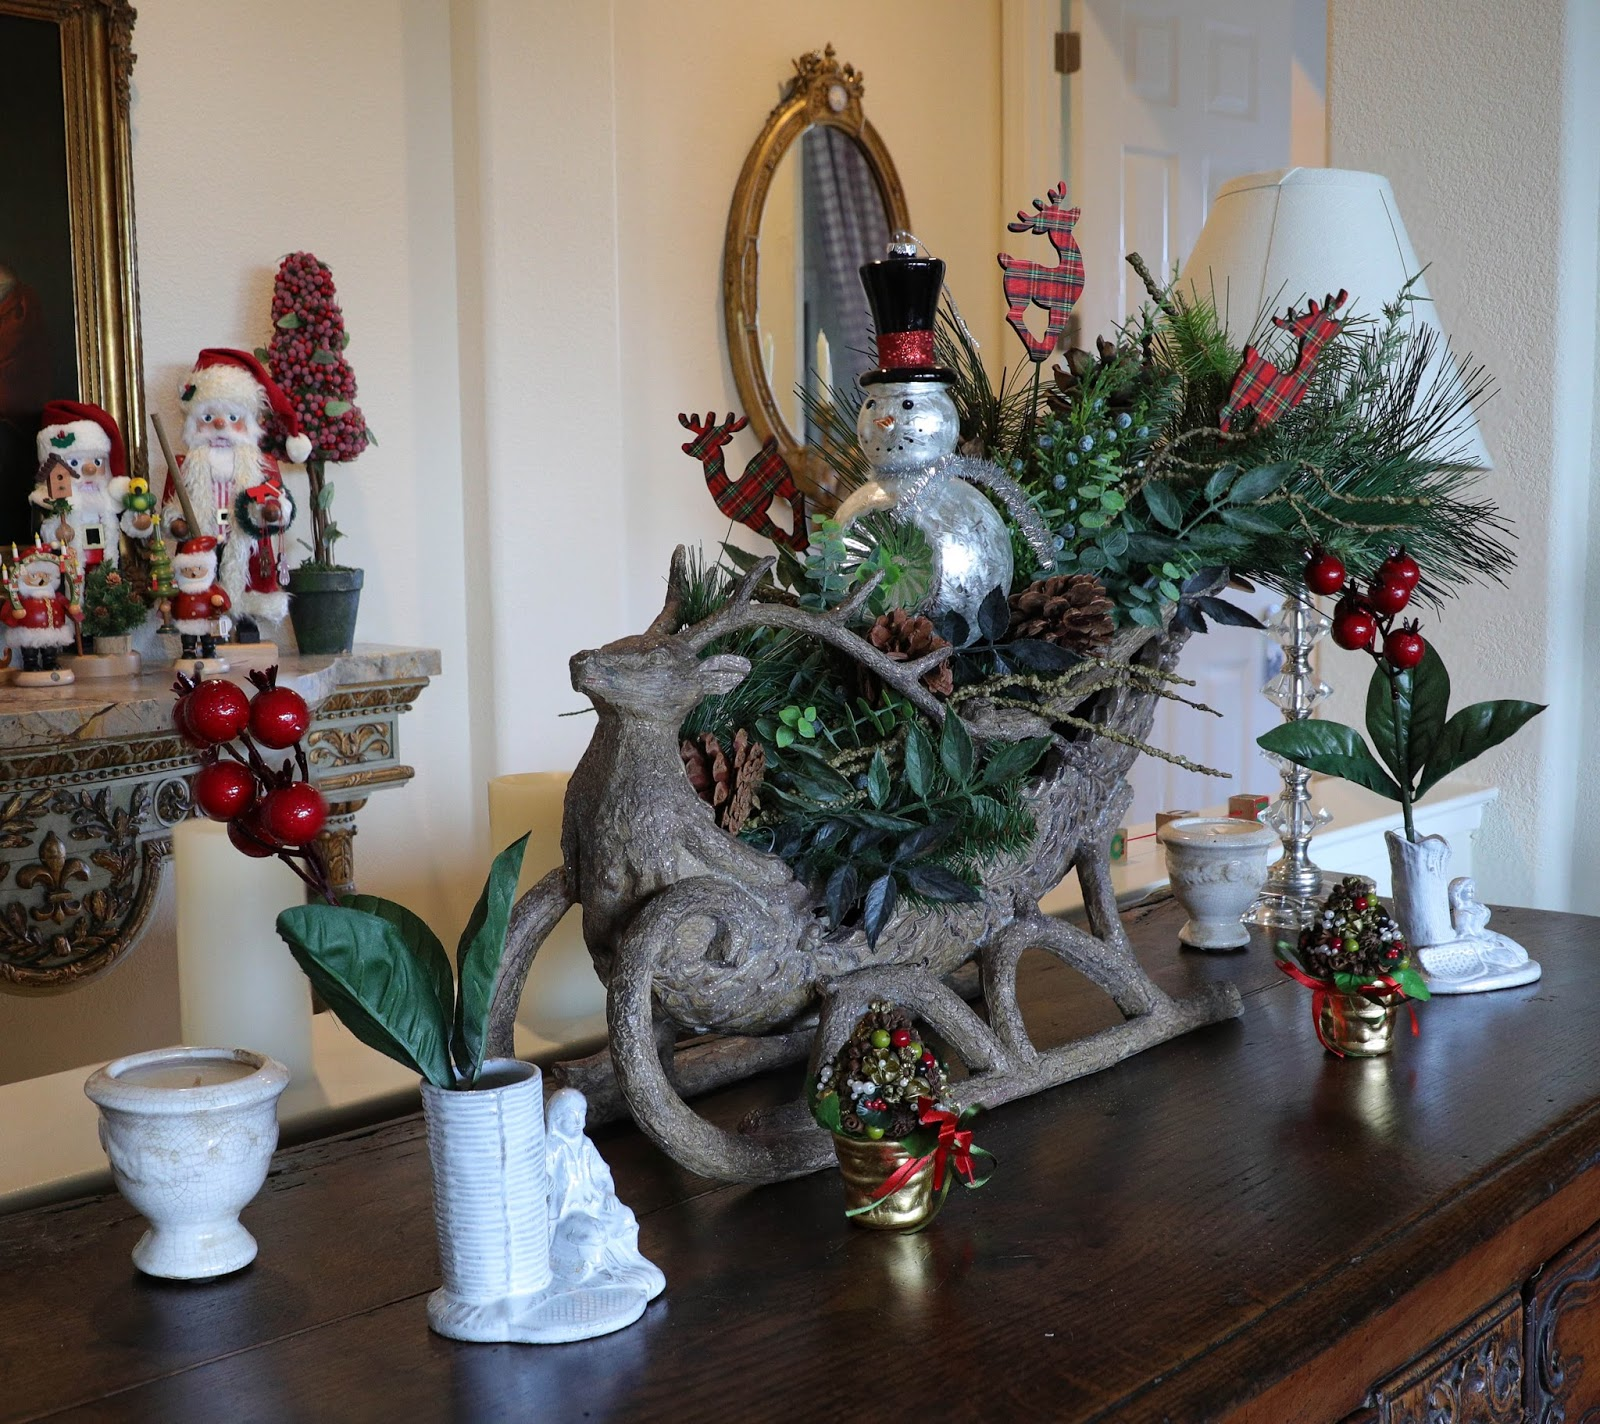 Farmhouse Christmas decorating inspiration